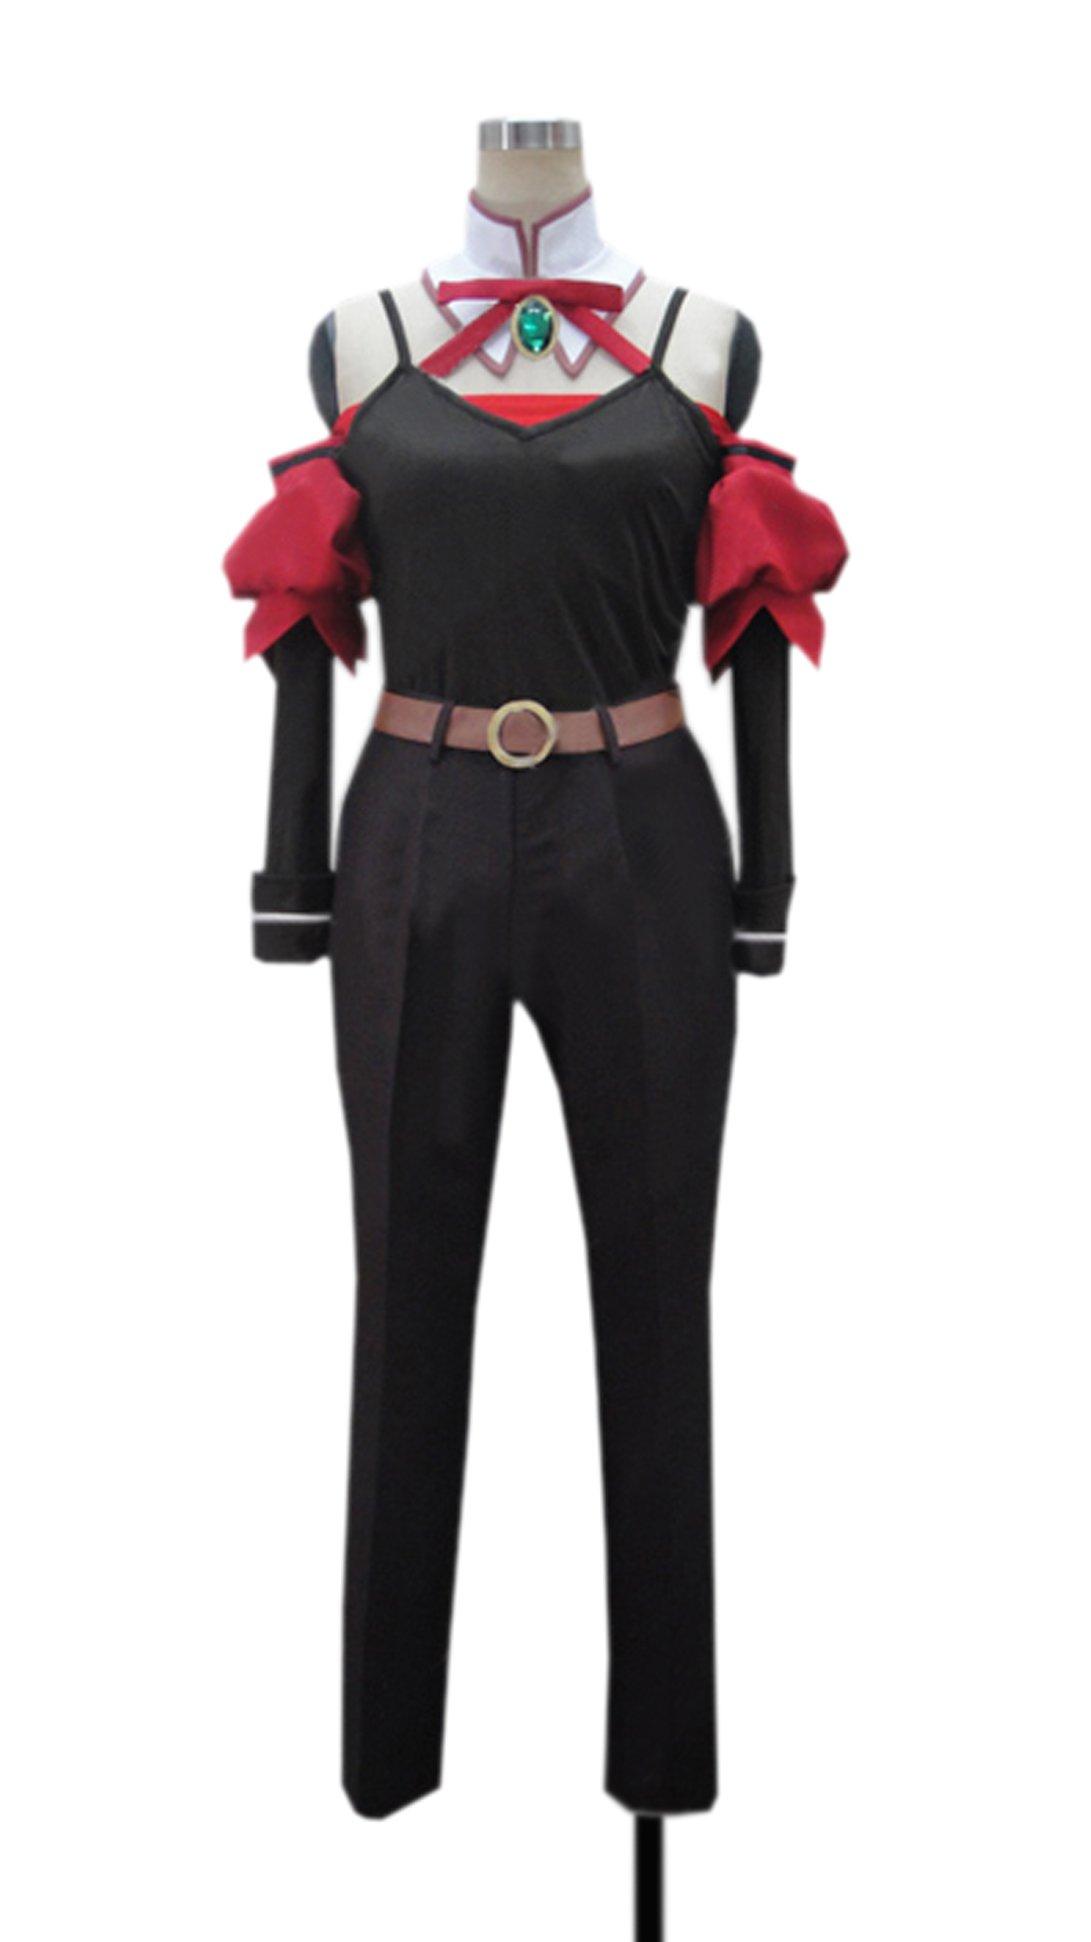 Dreamcosplay Campione! Erica Blandelli Logo Outfits Uniform Cosplay Costume